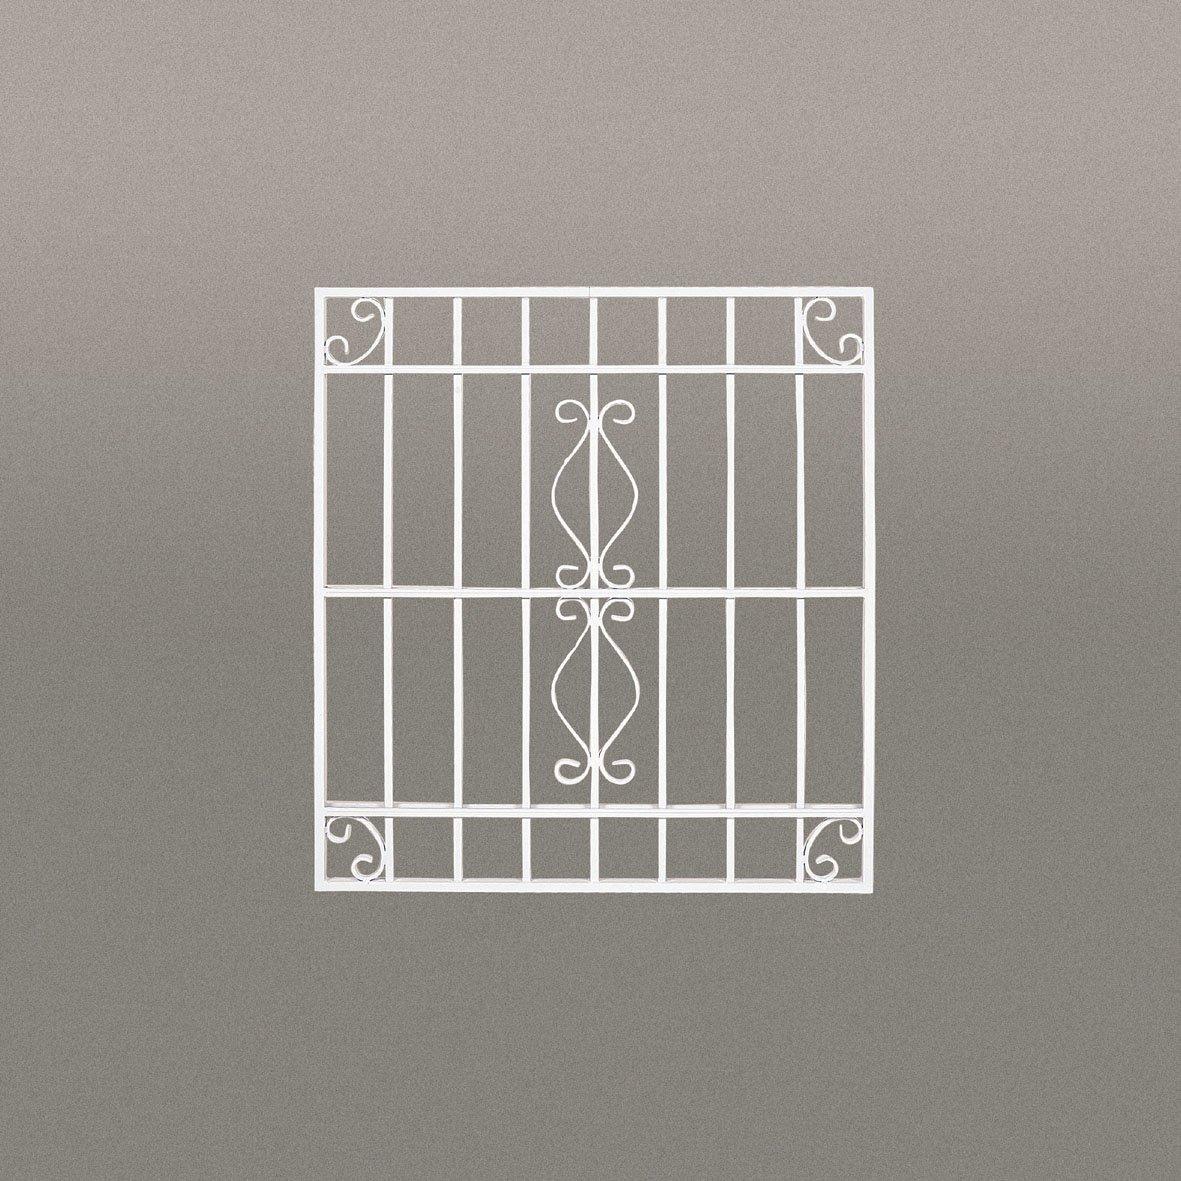 LLS ロートアルミ 装飾面格子 RAM01‐1009 1020*900 ホワイト B071F21QN8 28840  ホワイト